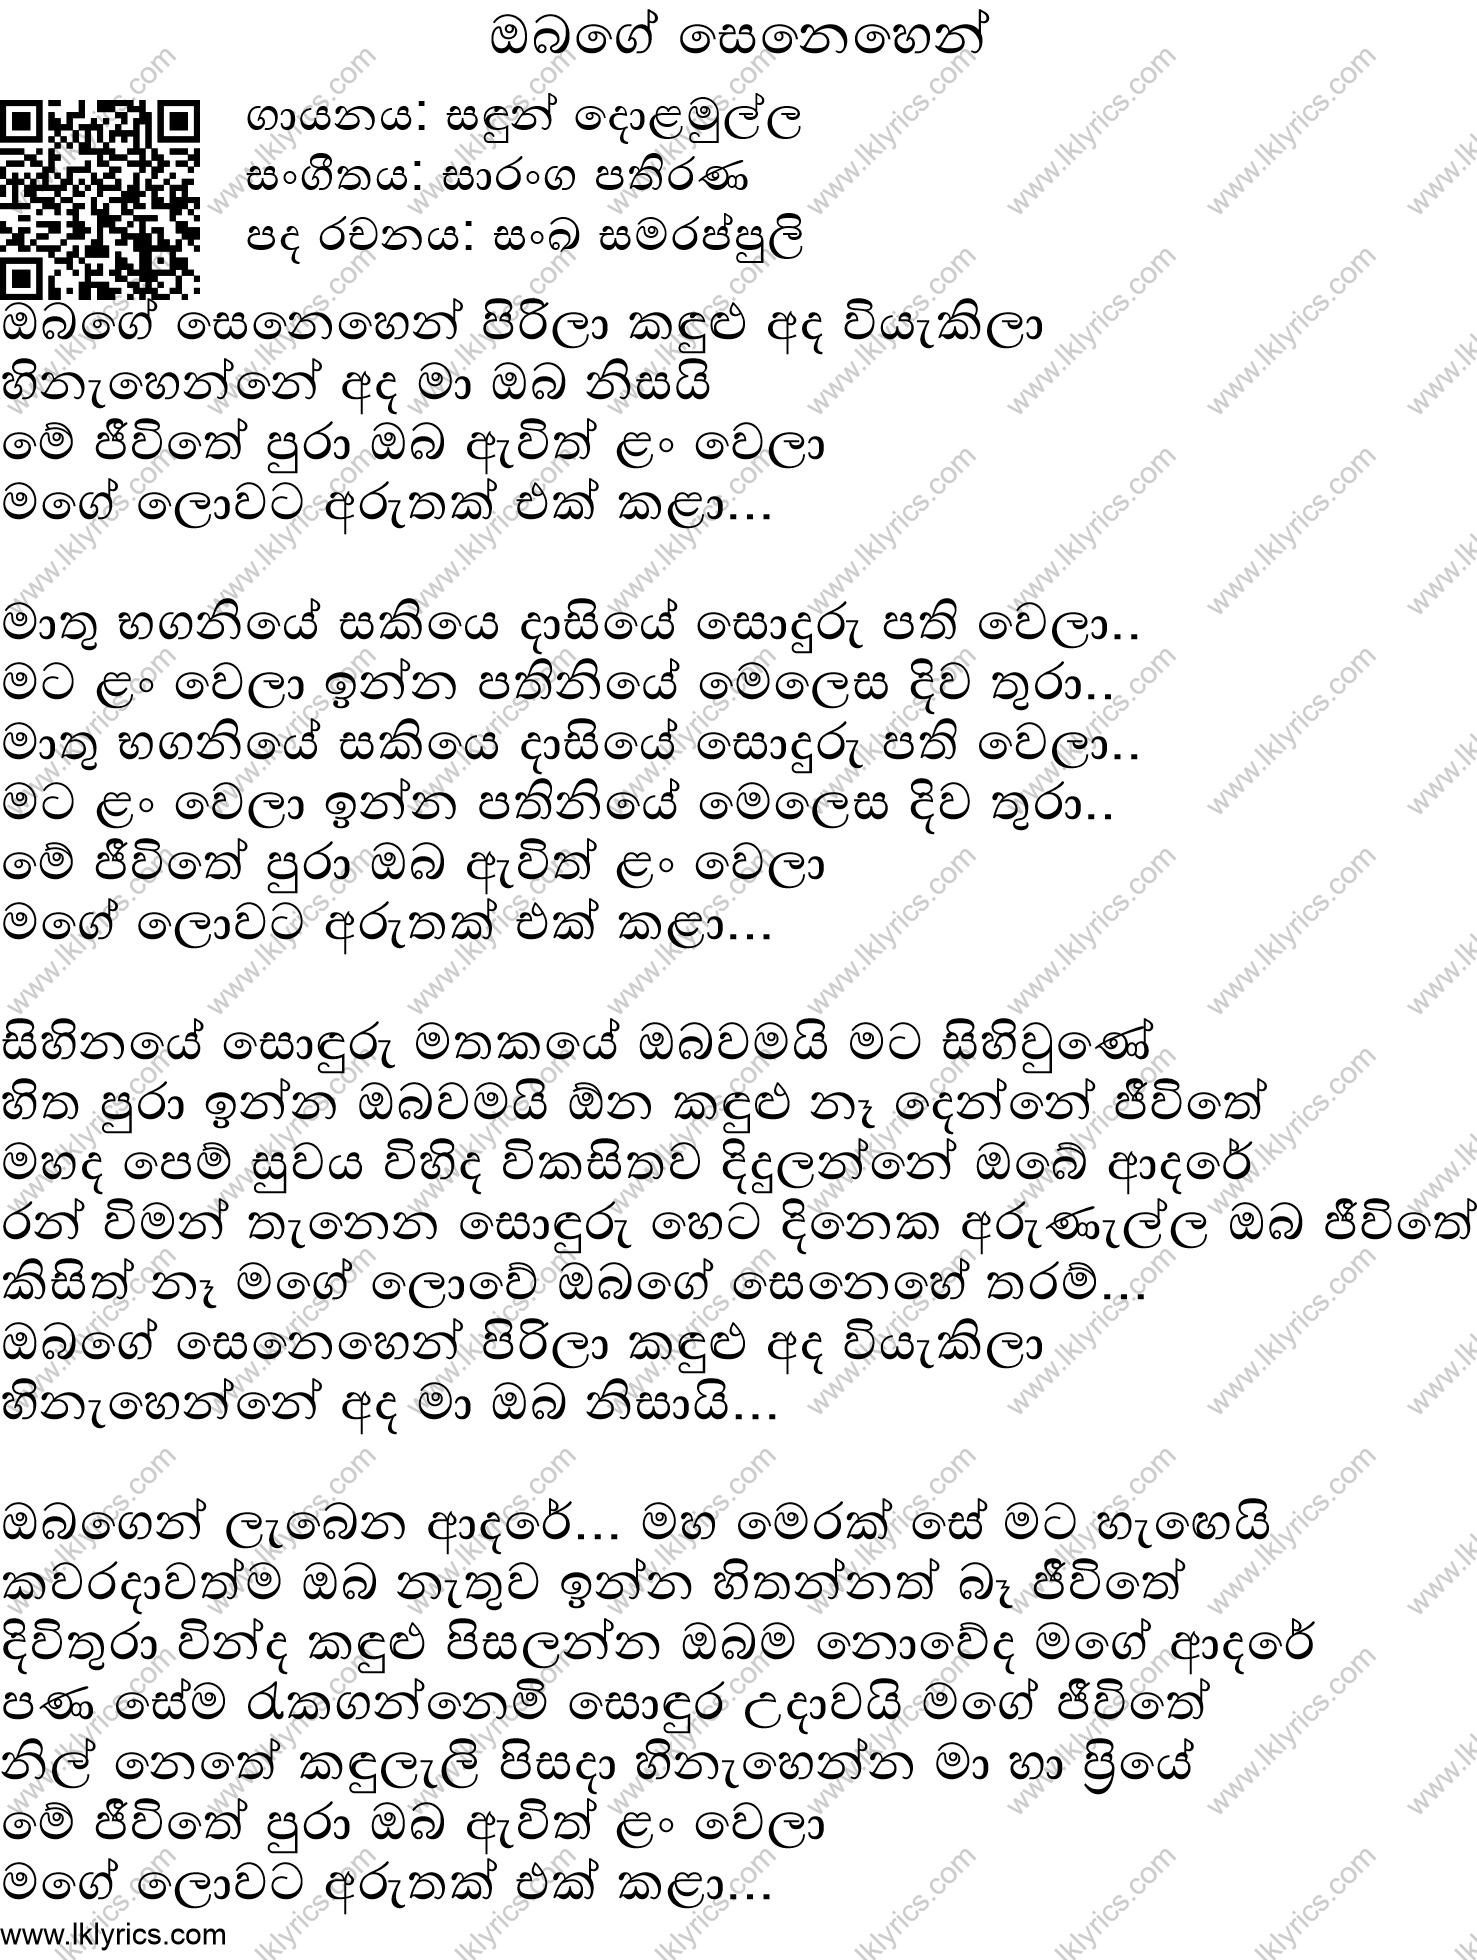 Obage Senehen Lyrics - LK Lyrics